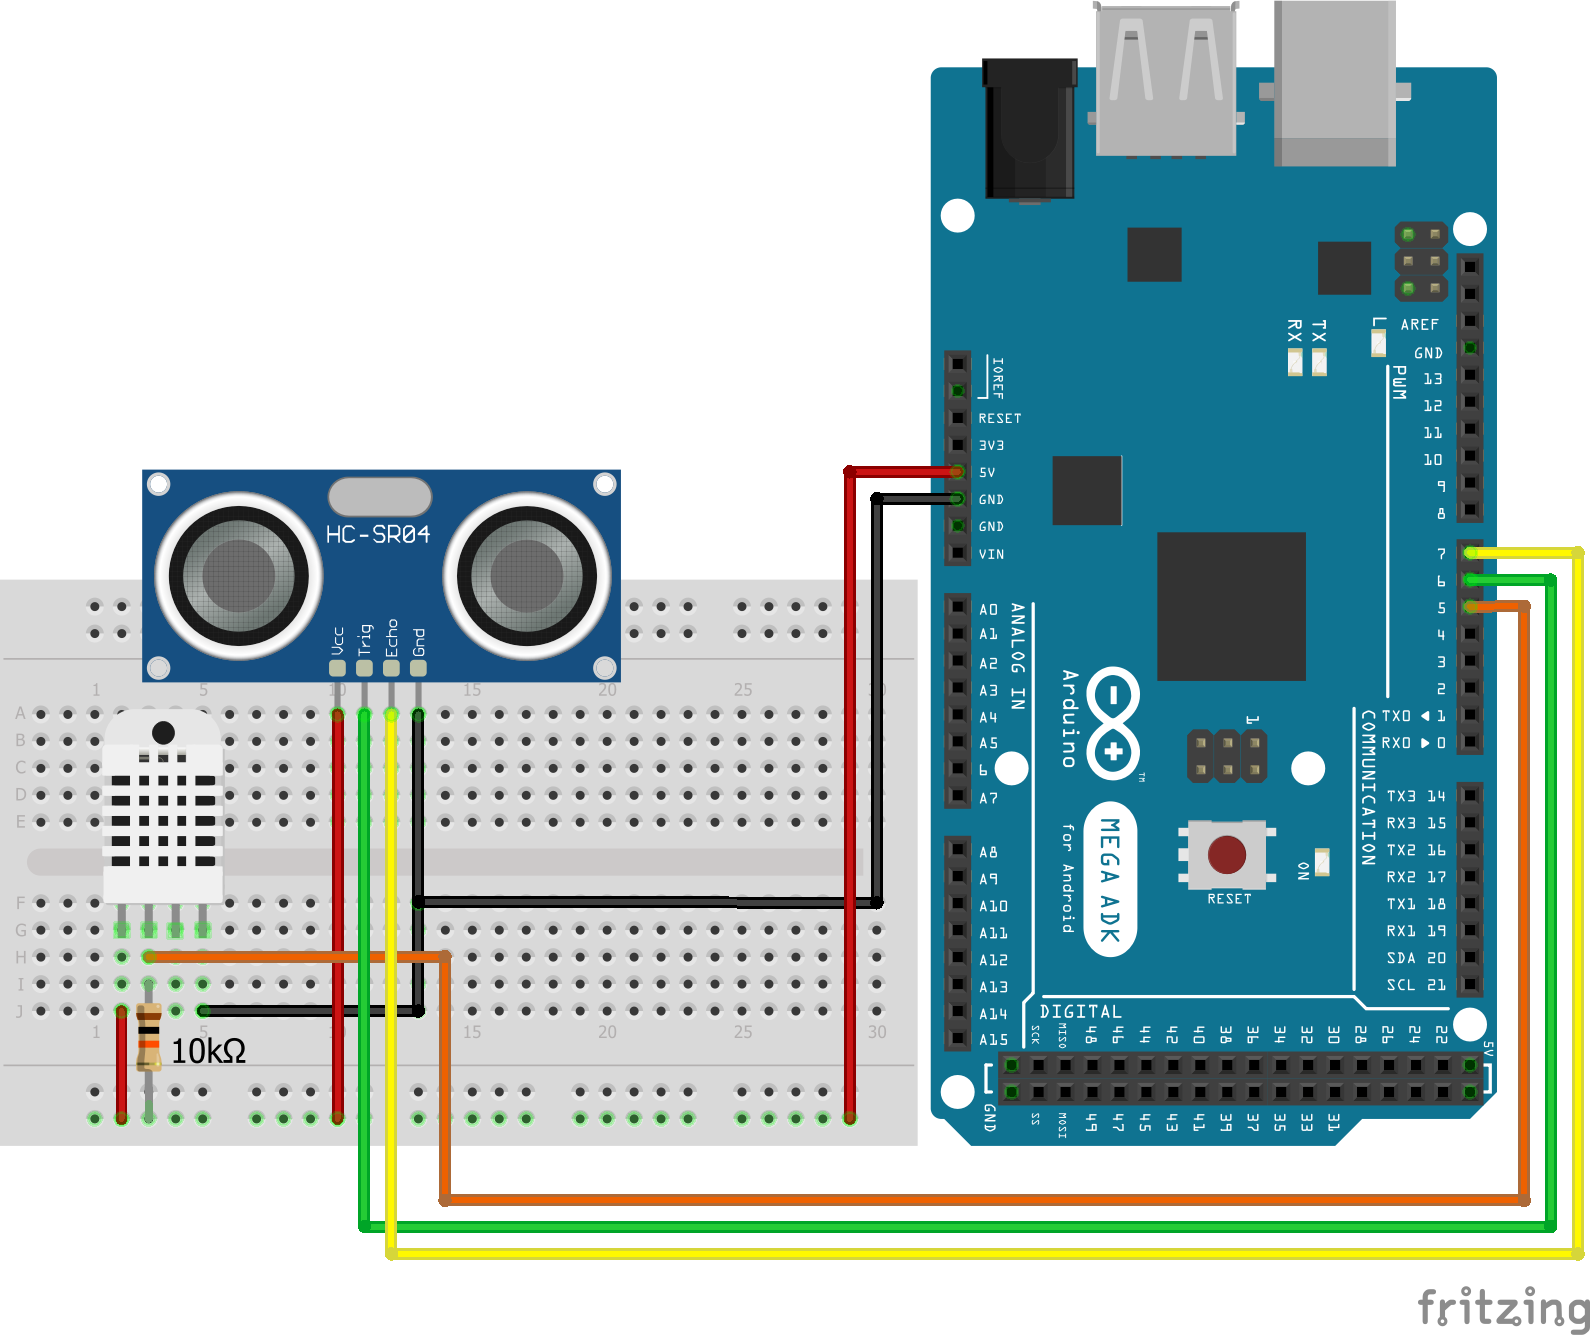 Wiring HC-SR04 Ultrasonic Distance Sensor DHT22 Arduino Mega